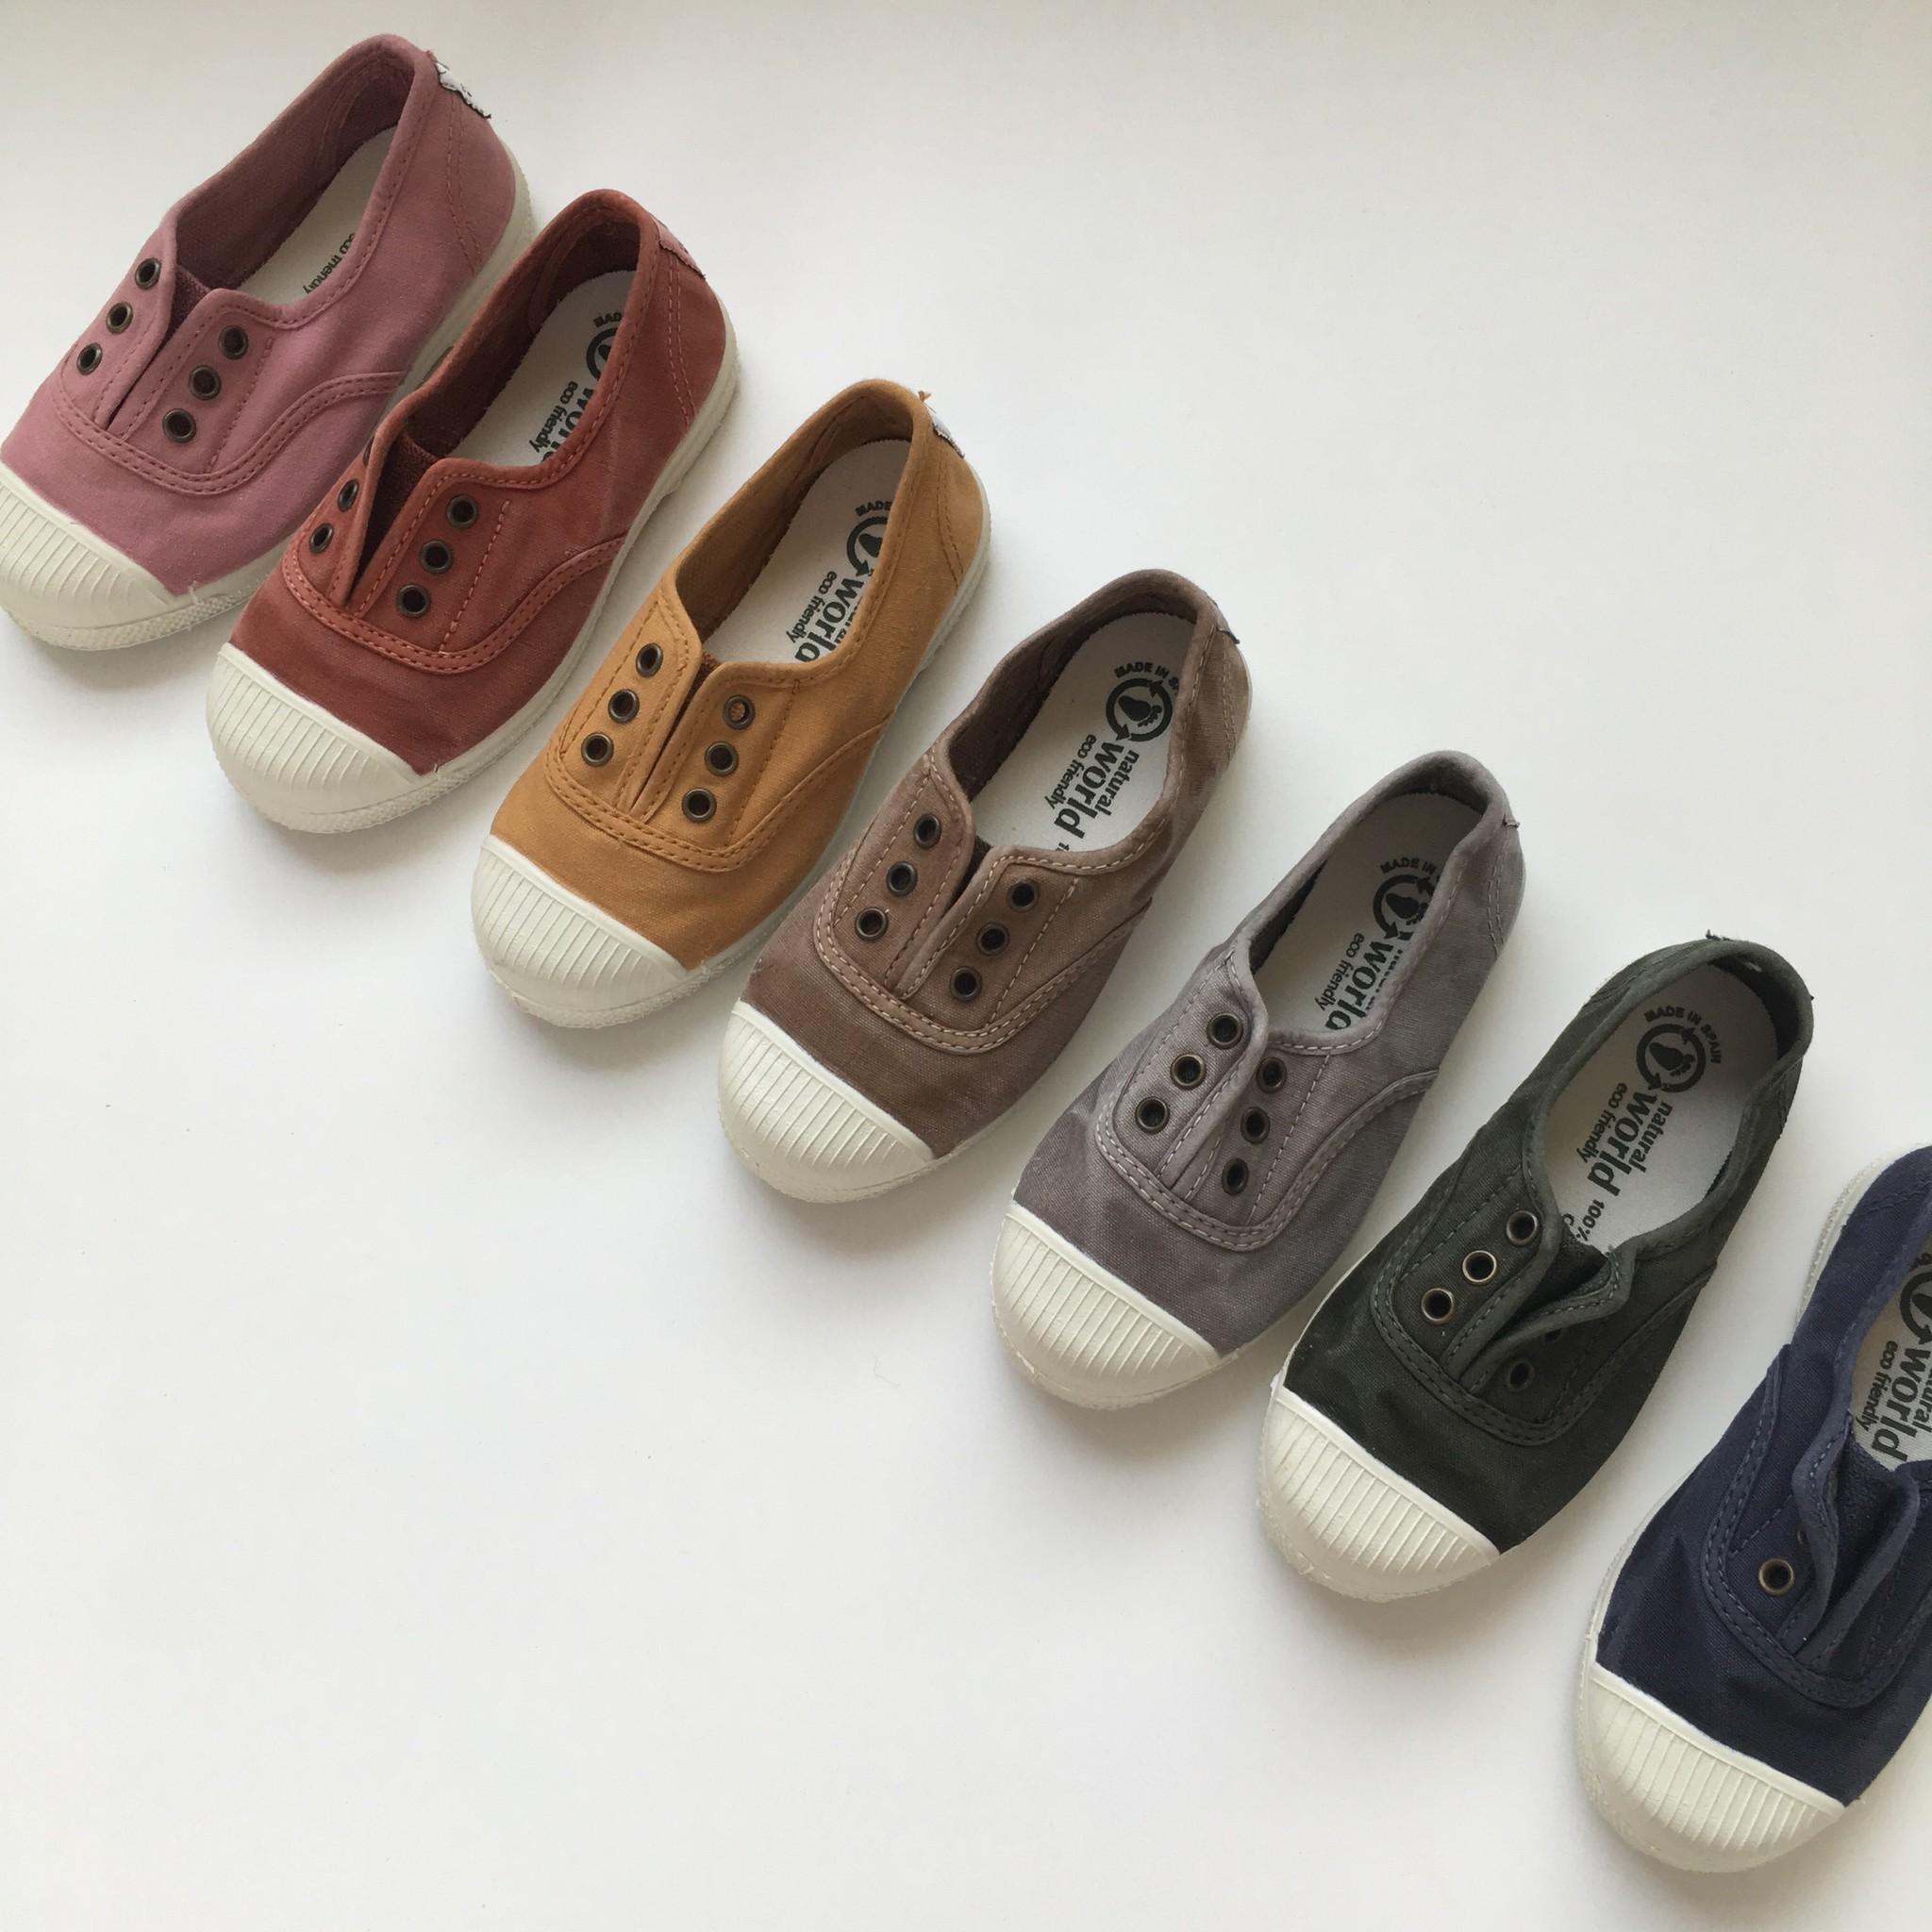 NATURAL WORLD eco kids sneakers OLD LAVANDA - organic cotton - stone washed khaki - 21 to 34